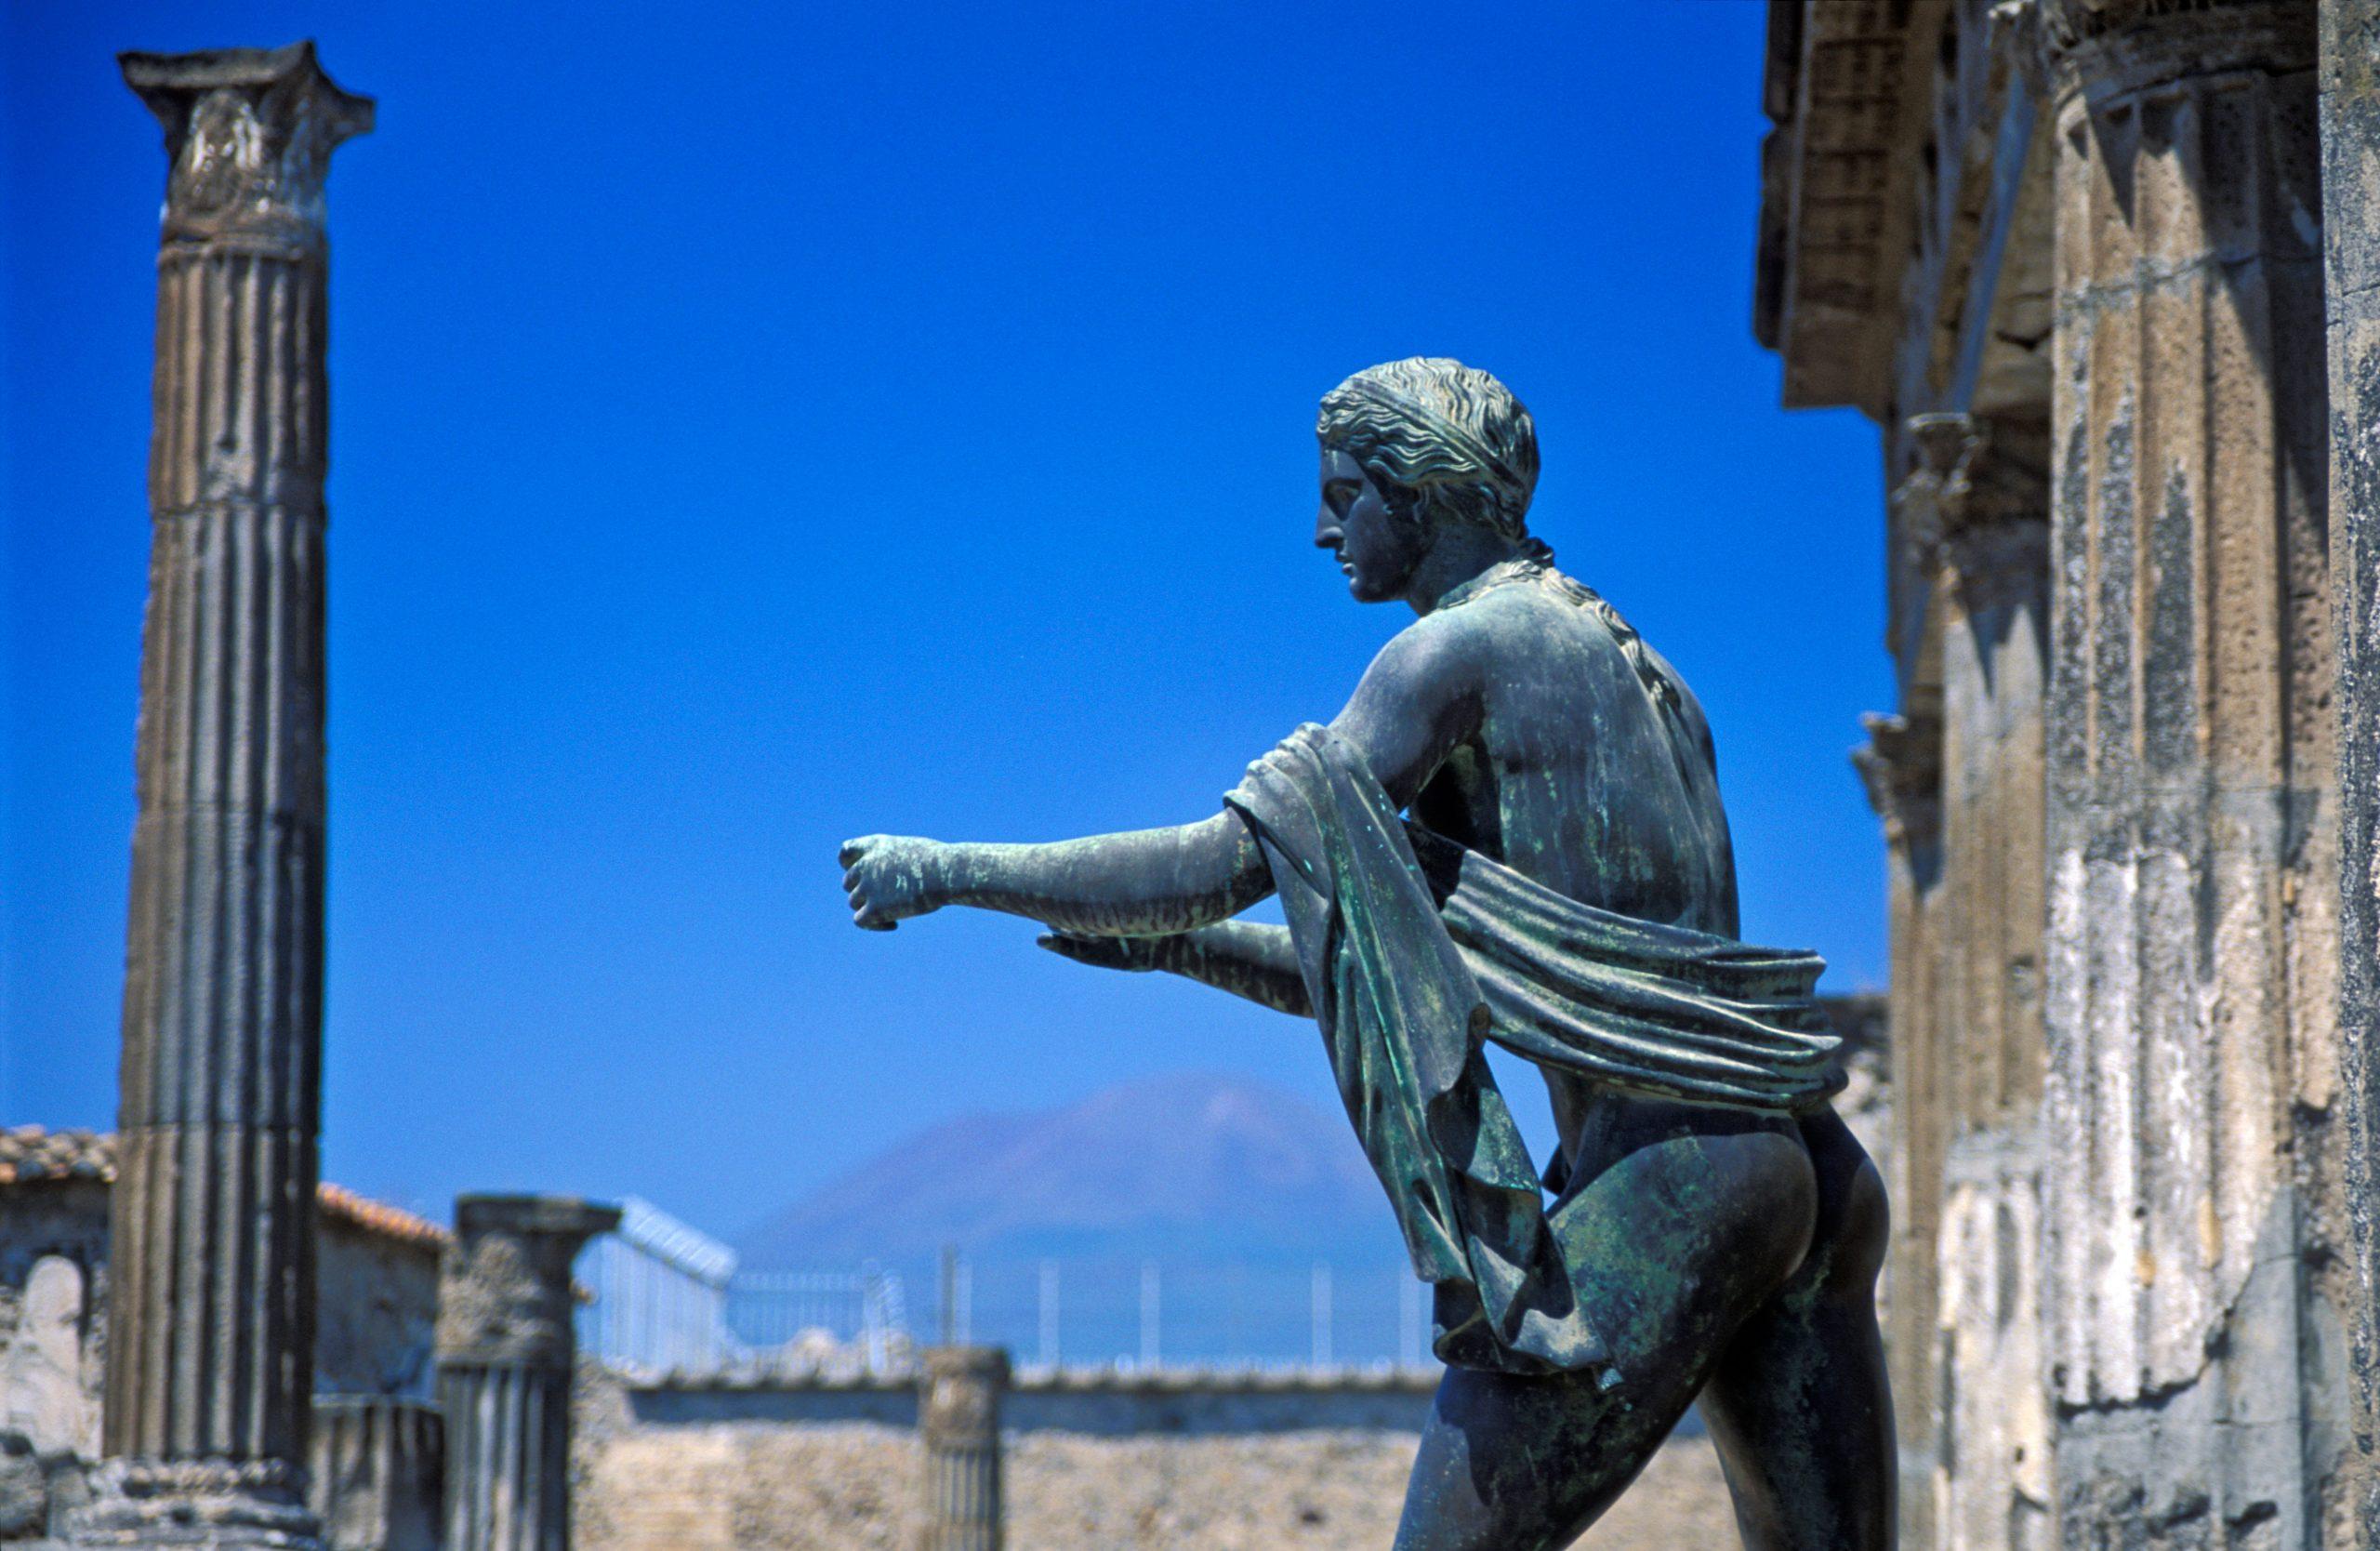 Apollo statue, Pompeii